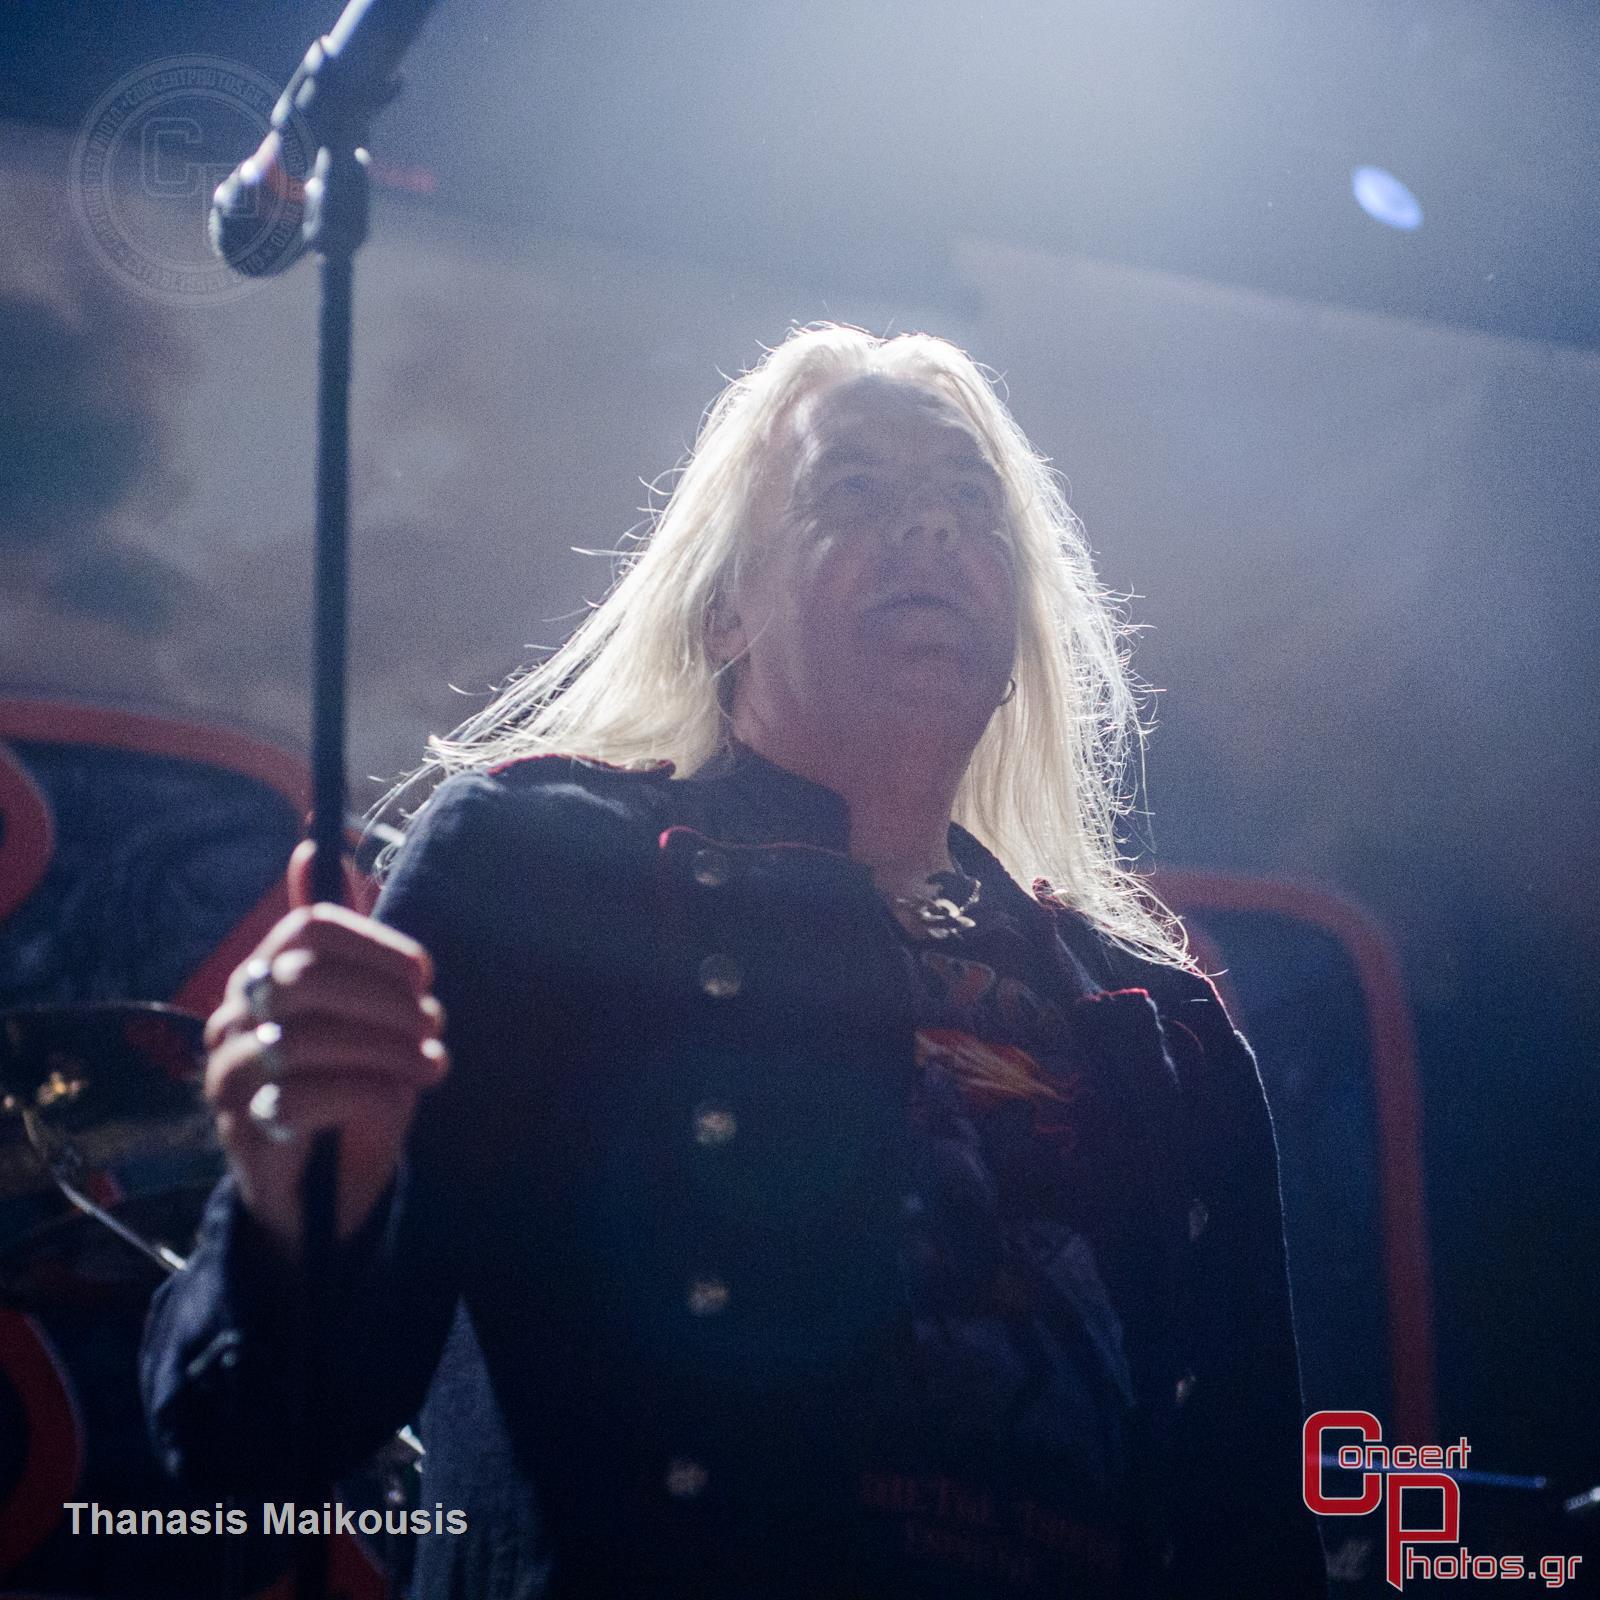 Saxon & Innerwish -Saxon Innerwish Gagarin photographer: Thanasis Maikousis - concertphotos_20141025_22_38_04